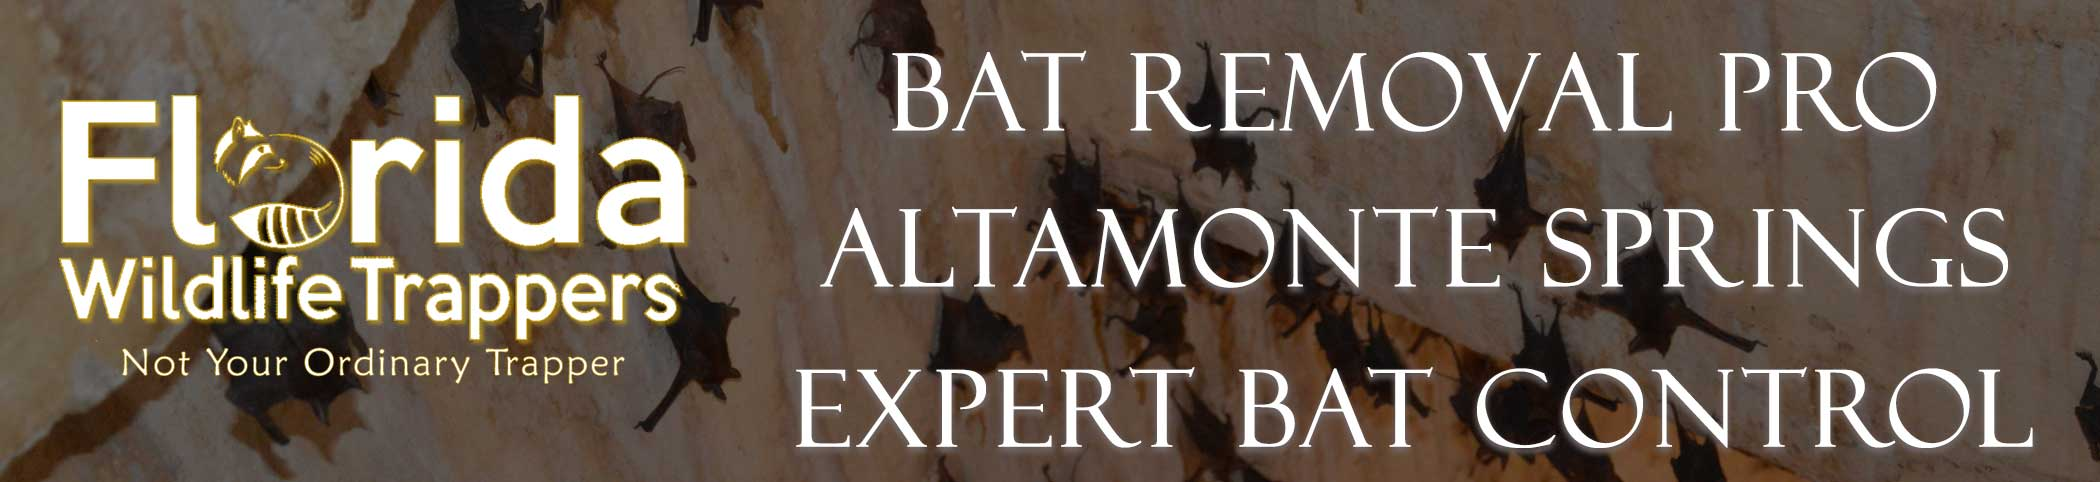 florida-wildlife-trappers-Altamonte Springs